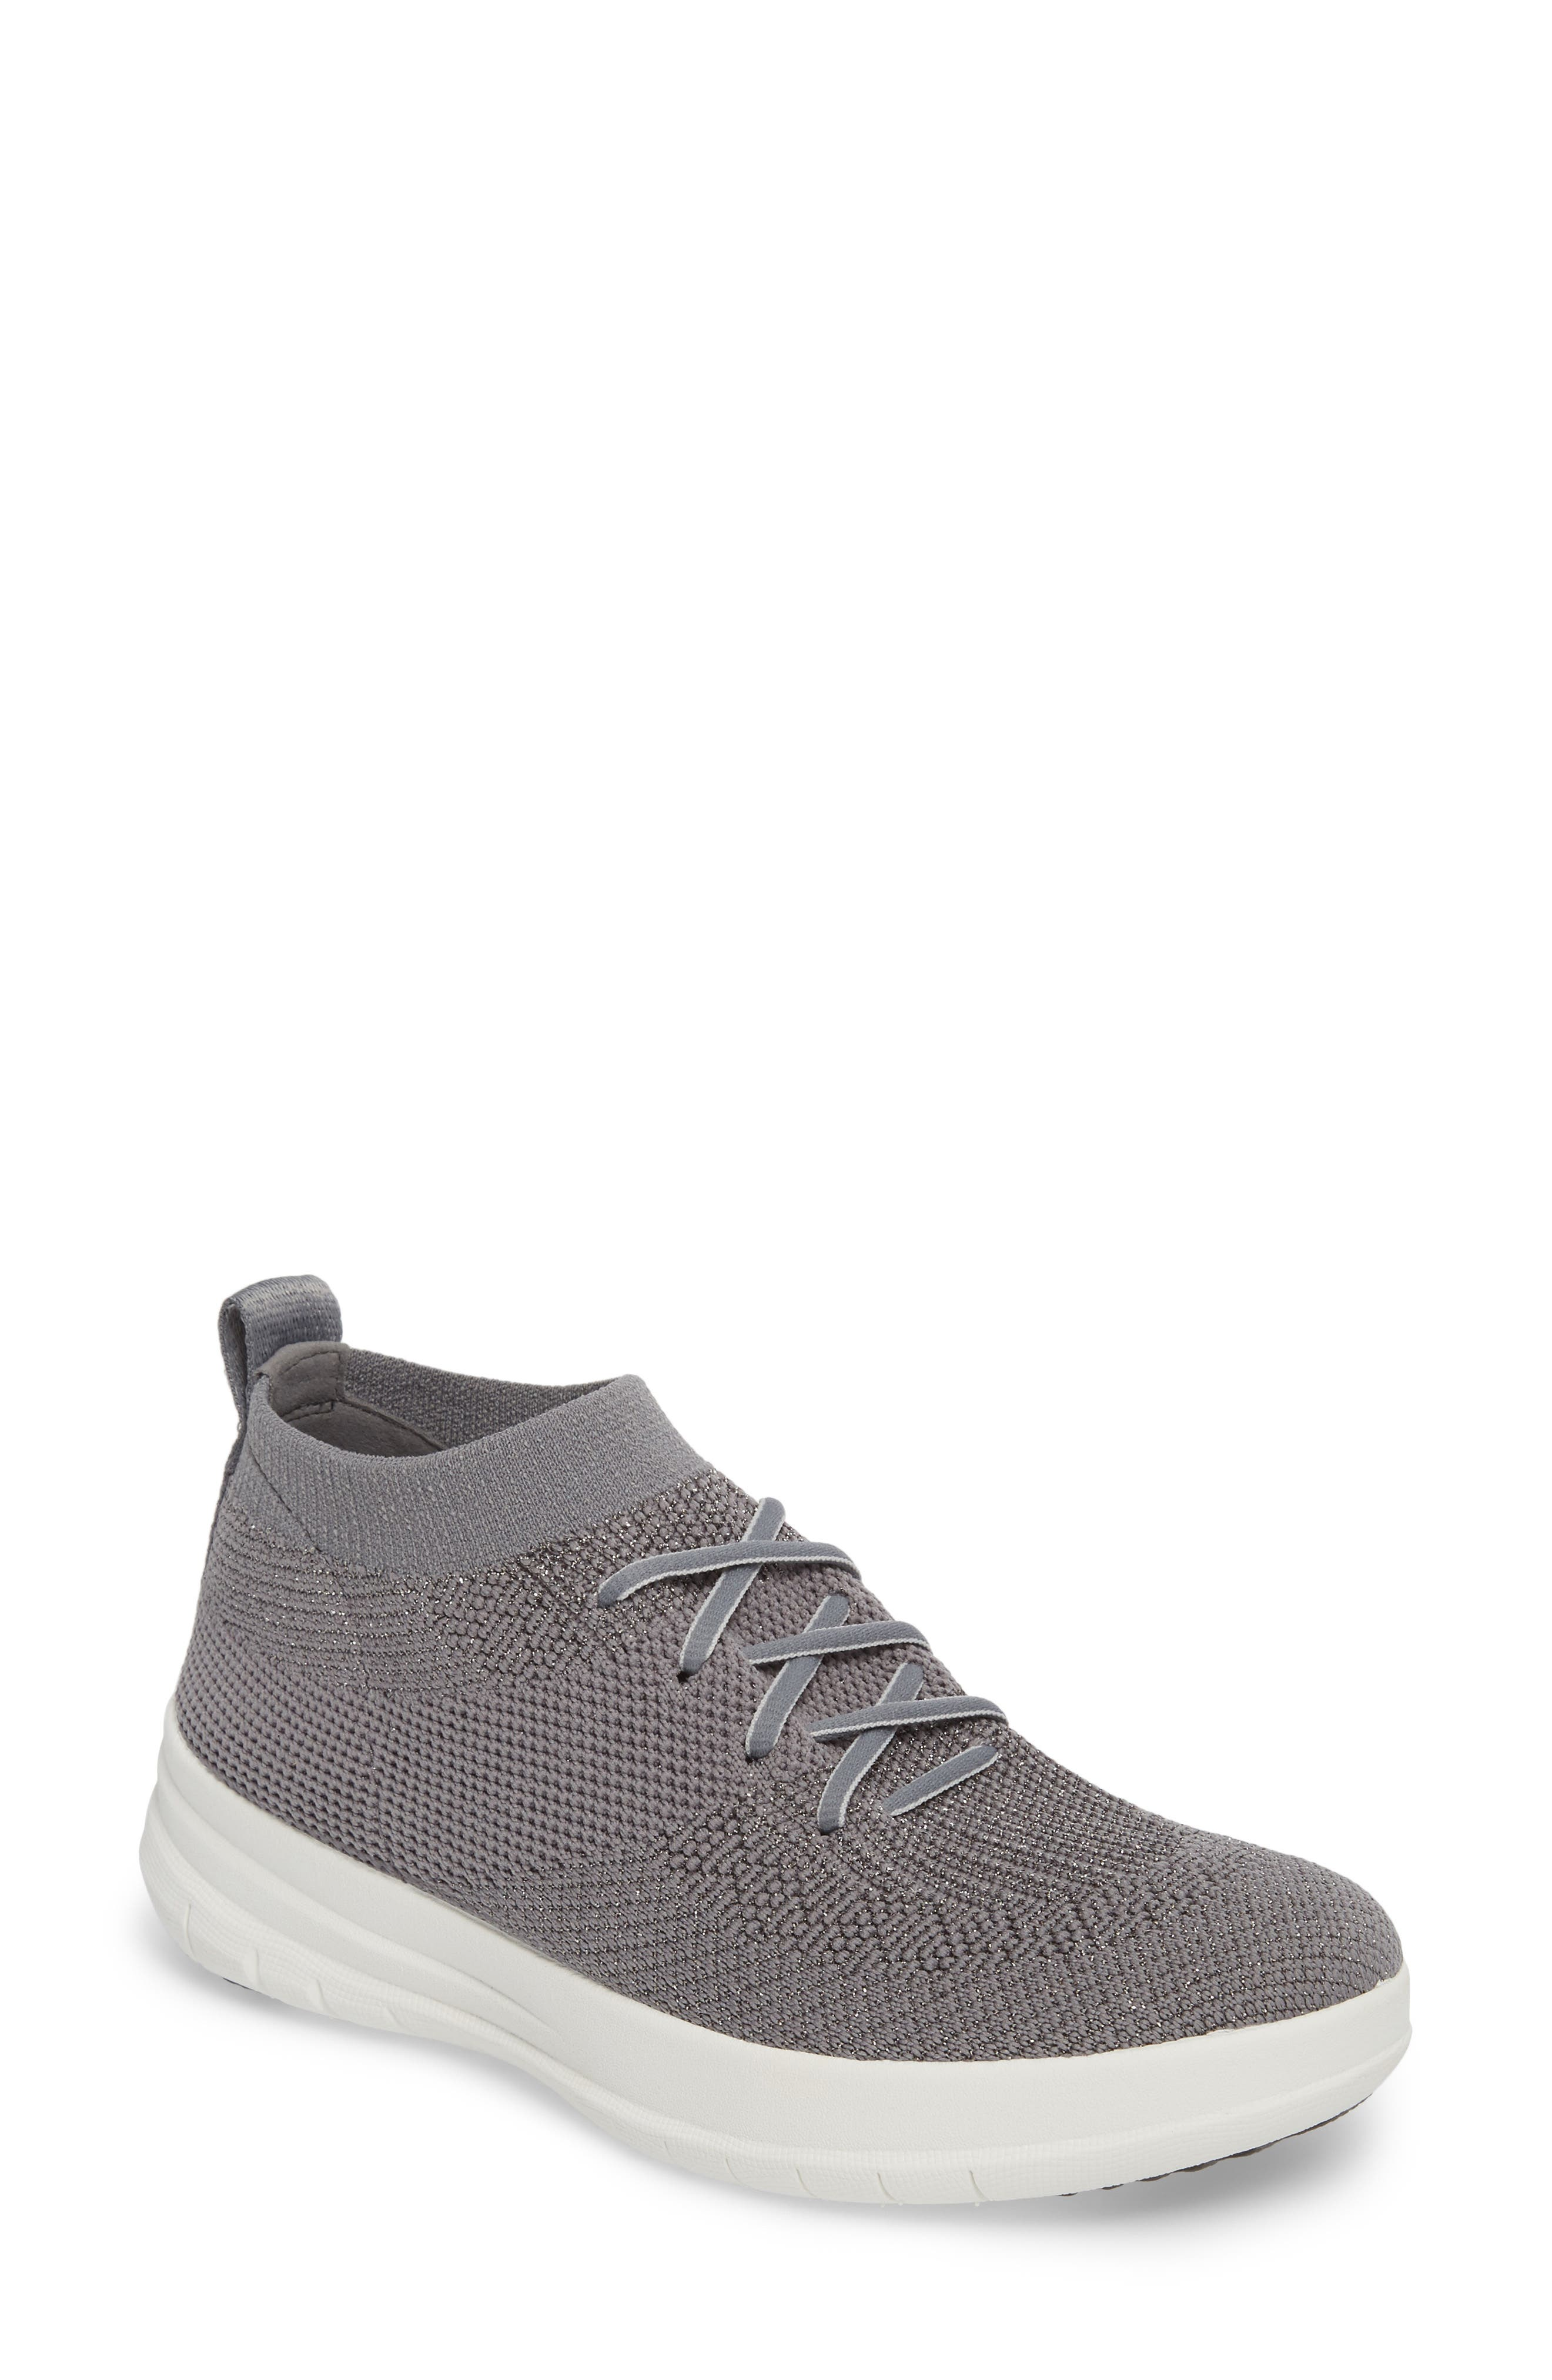 Main Image - FitFlop Uberknit™ Slip-On High-Top Sneaker (Women)